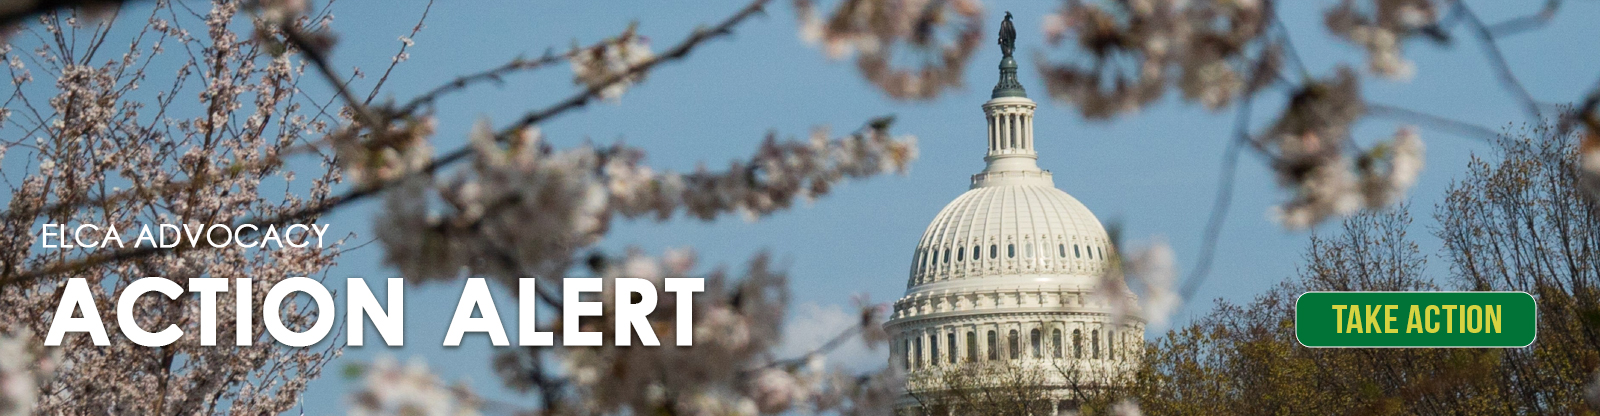 Advocacy Action Alert Capitol